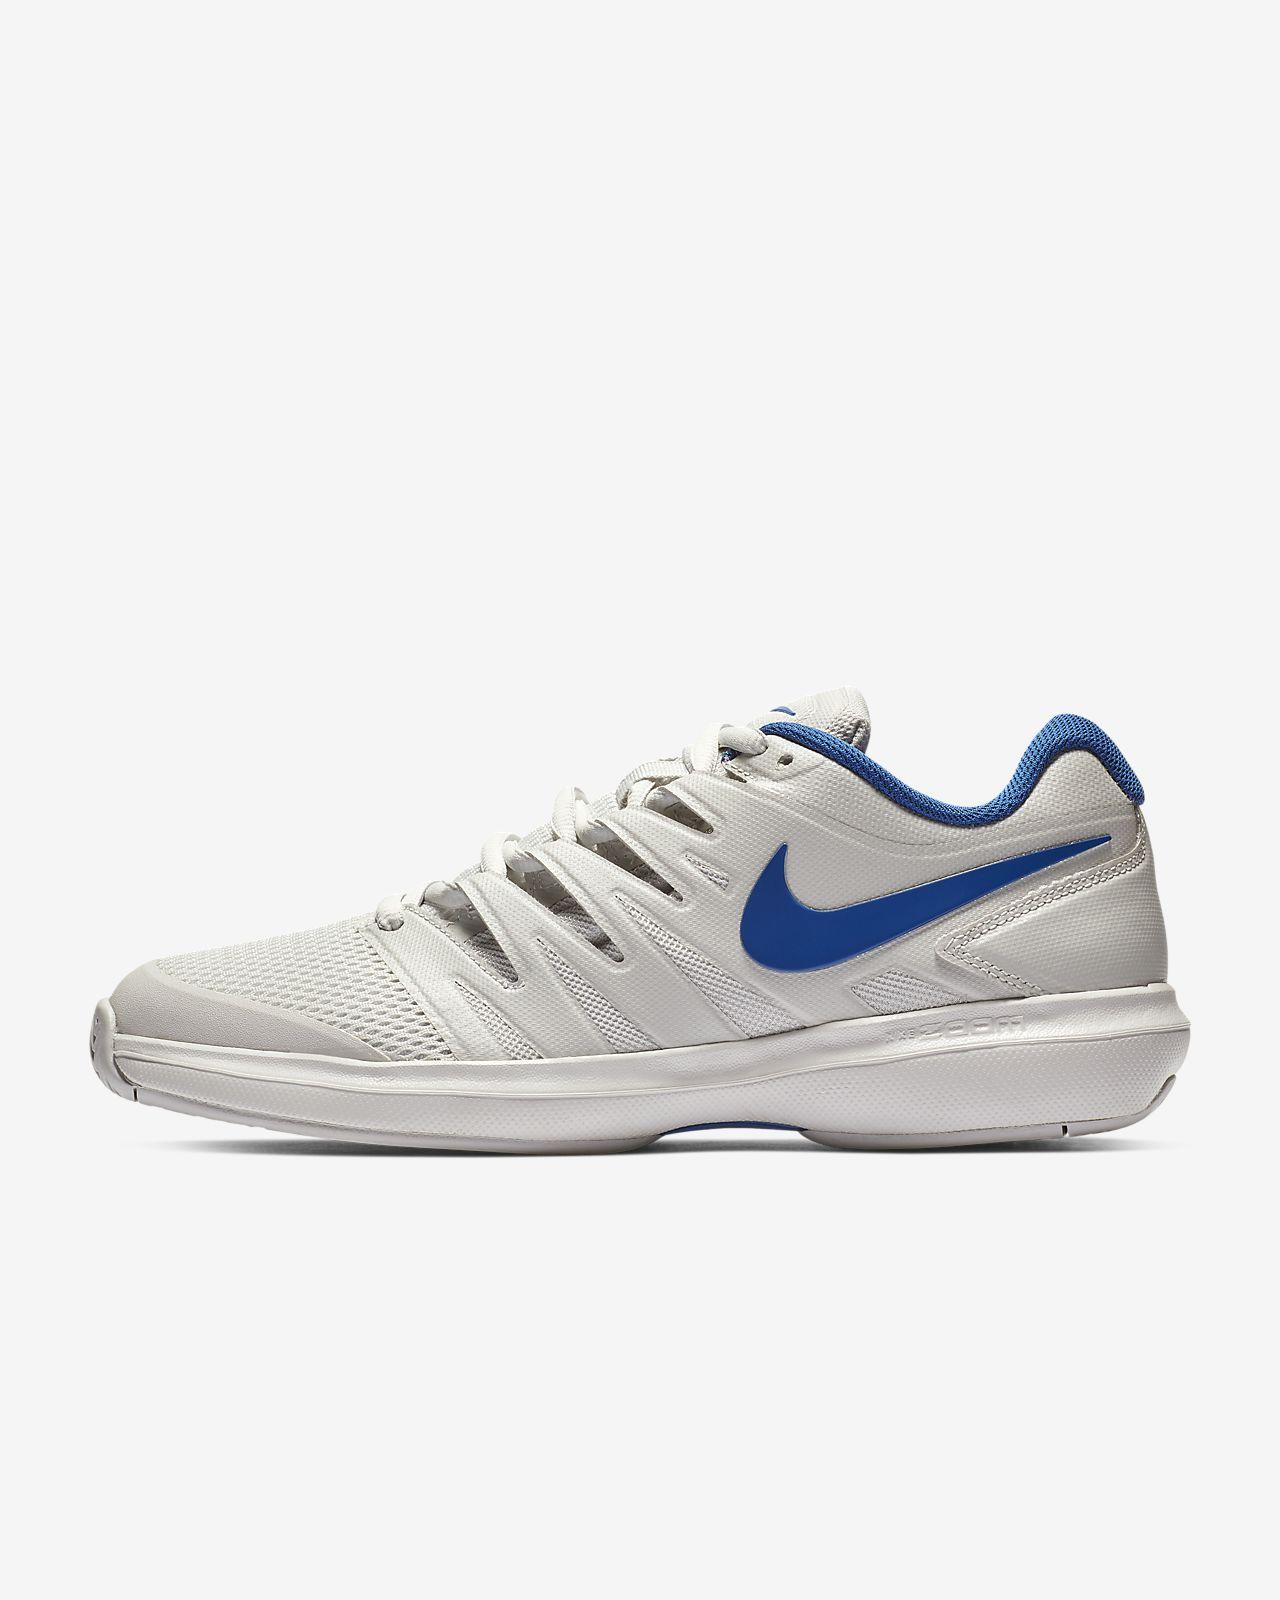 competitive price 7baa6 194a1 NikeCourt Air Zoom Prestige-hardcourt-tennissko til mænd